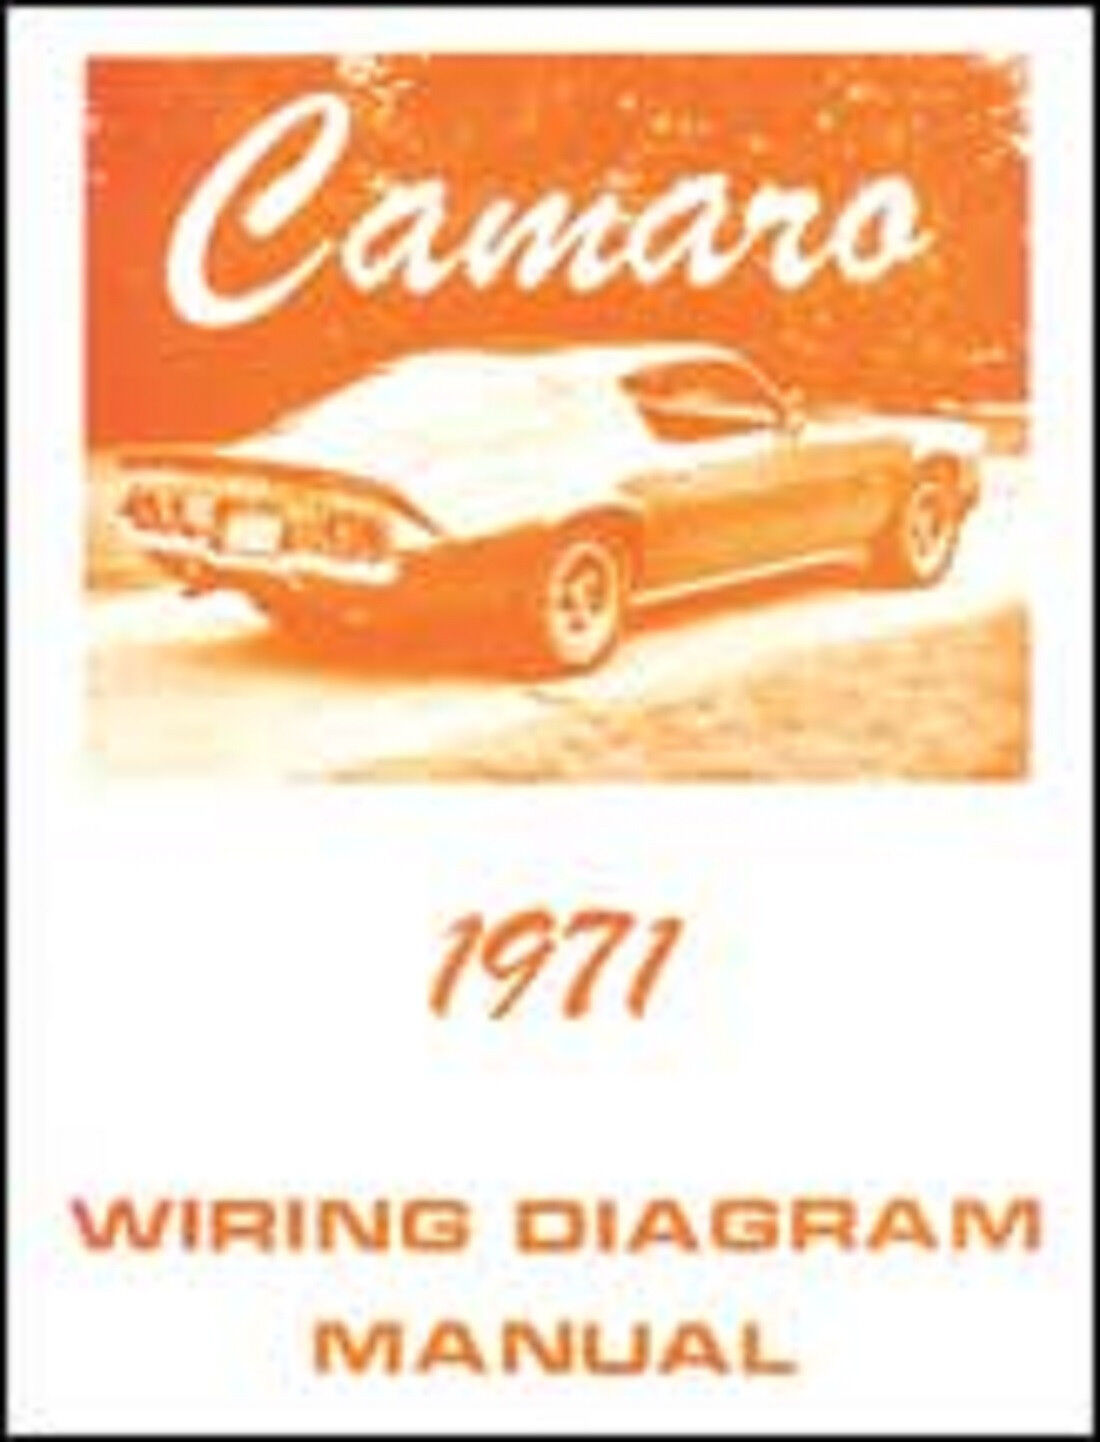 1971 Camaro Wiring Diagram from i.ebayimg.com